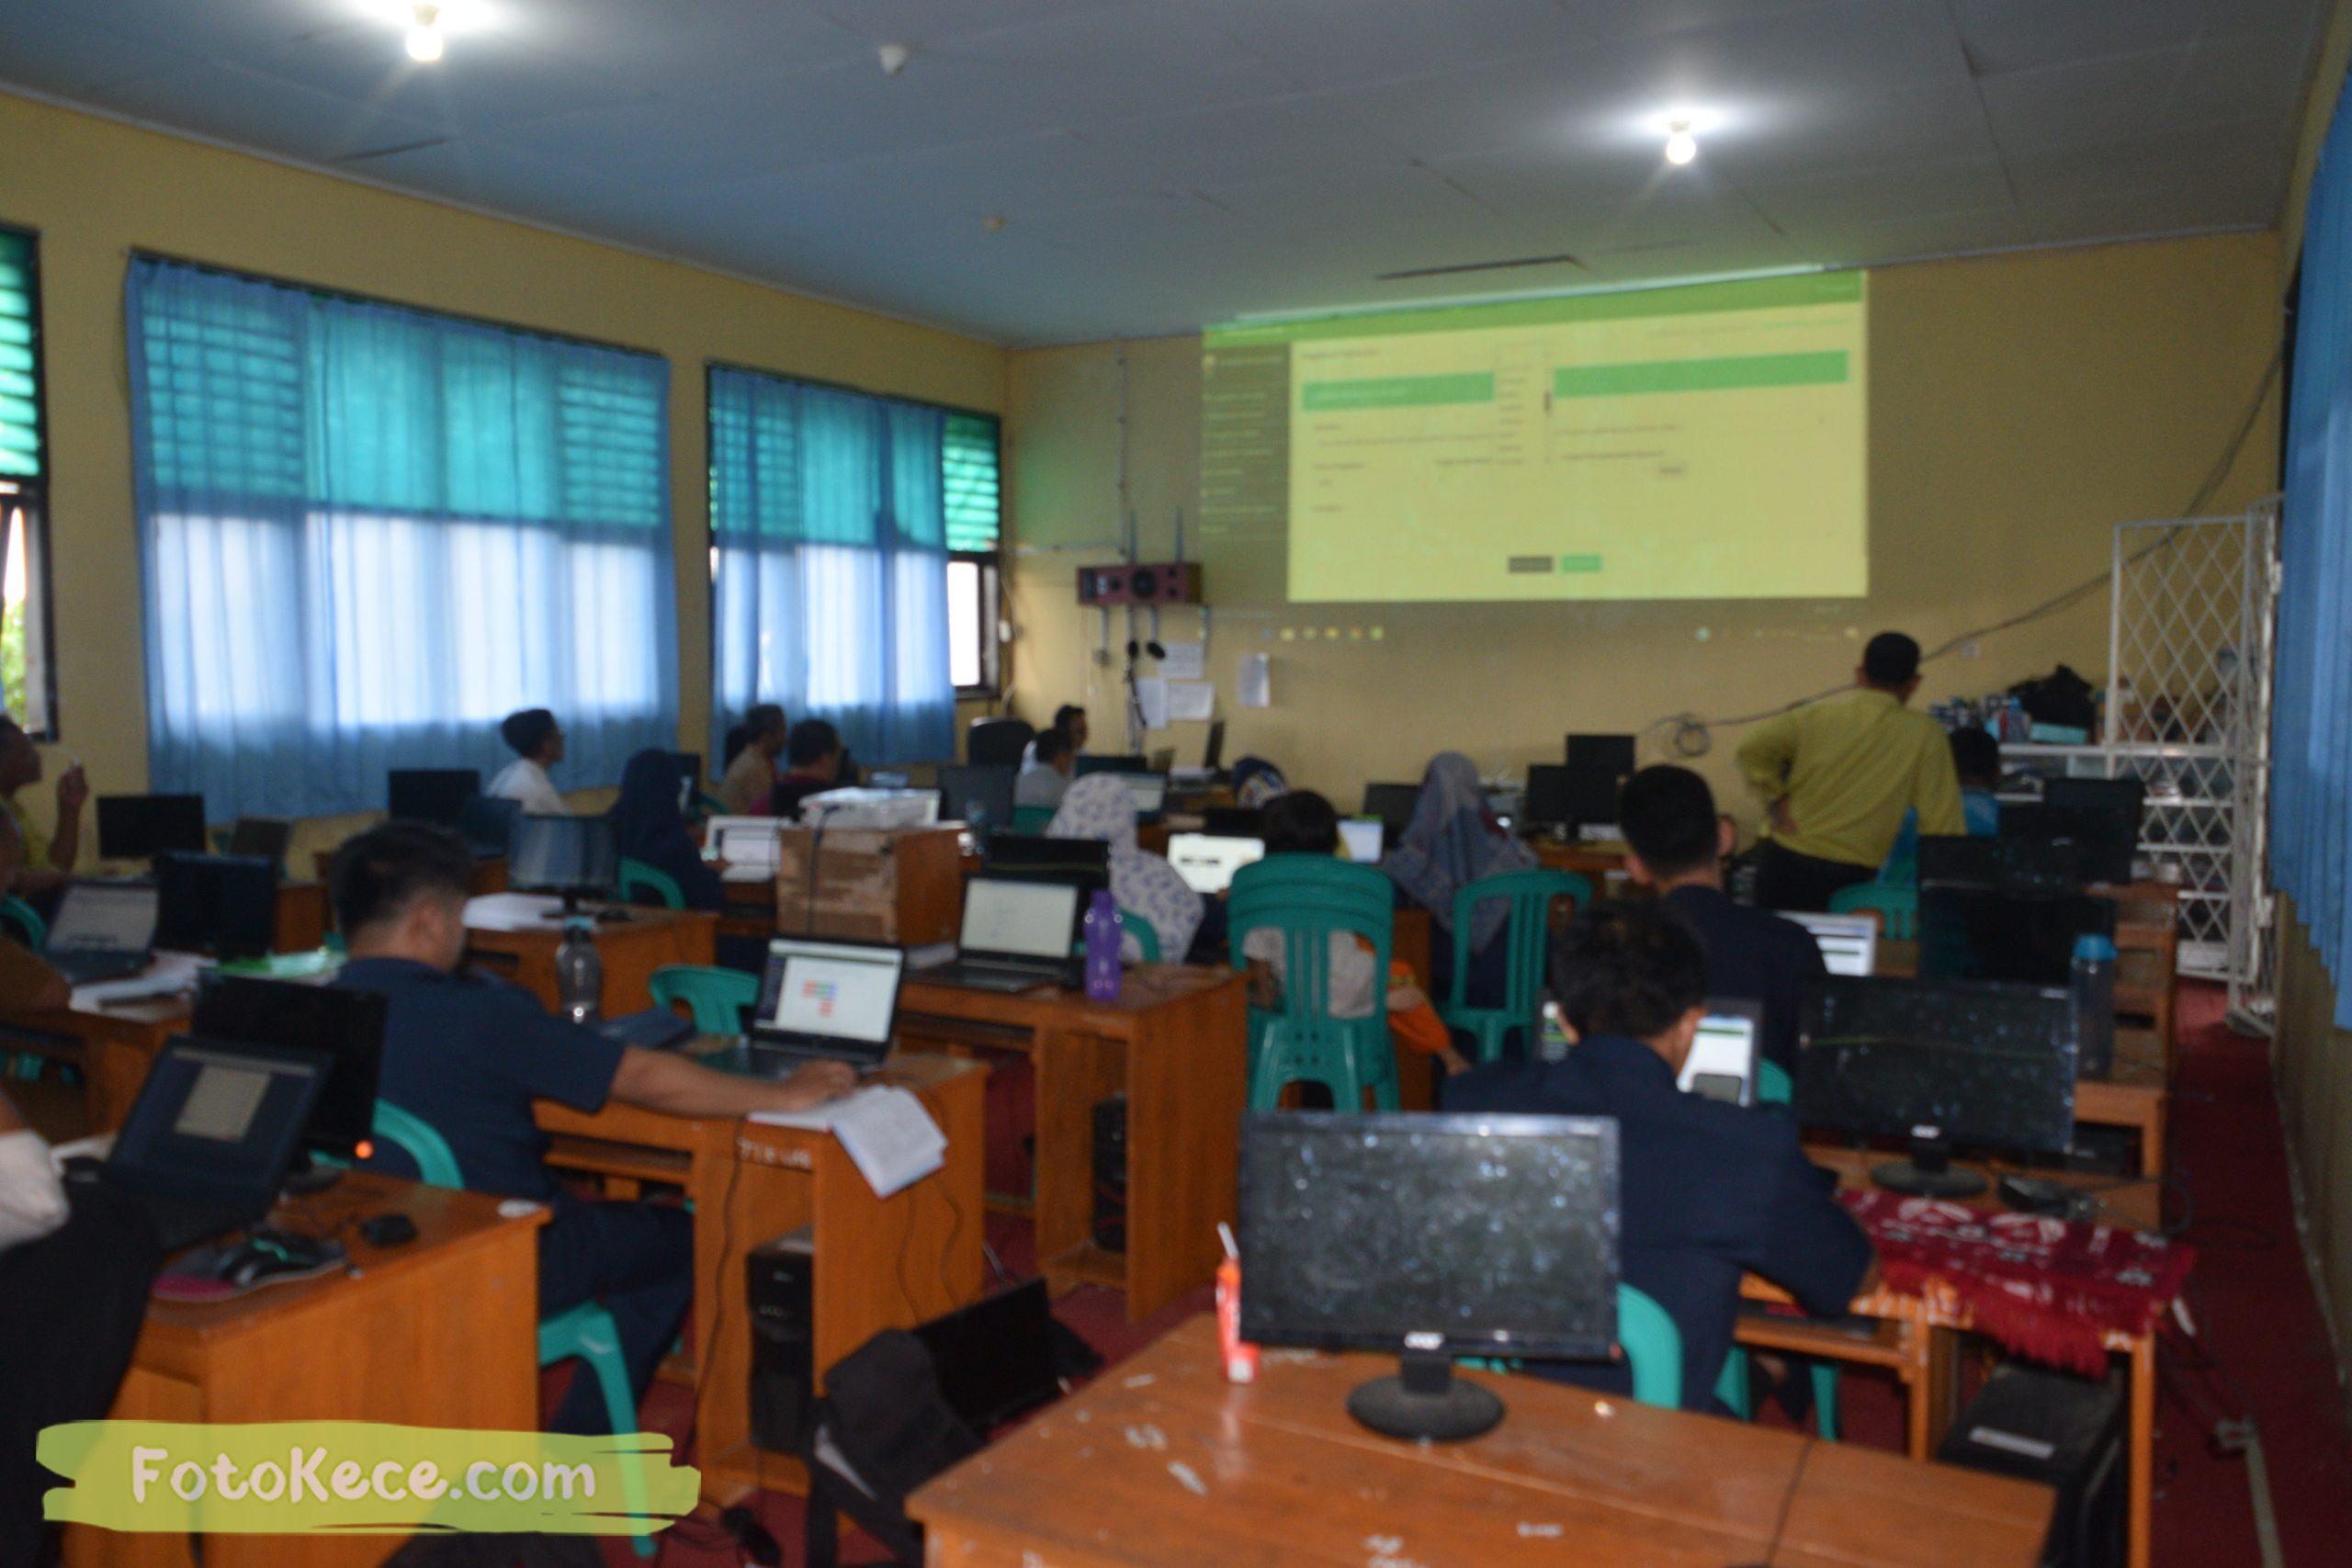 bimbingan teknis sieka 2020 bersama Bpk Abdul Aziz 08012020 fotokece 16 scaled